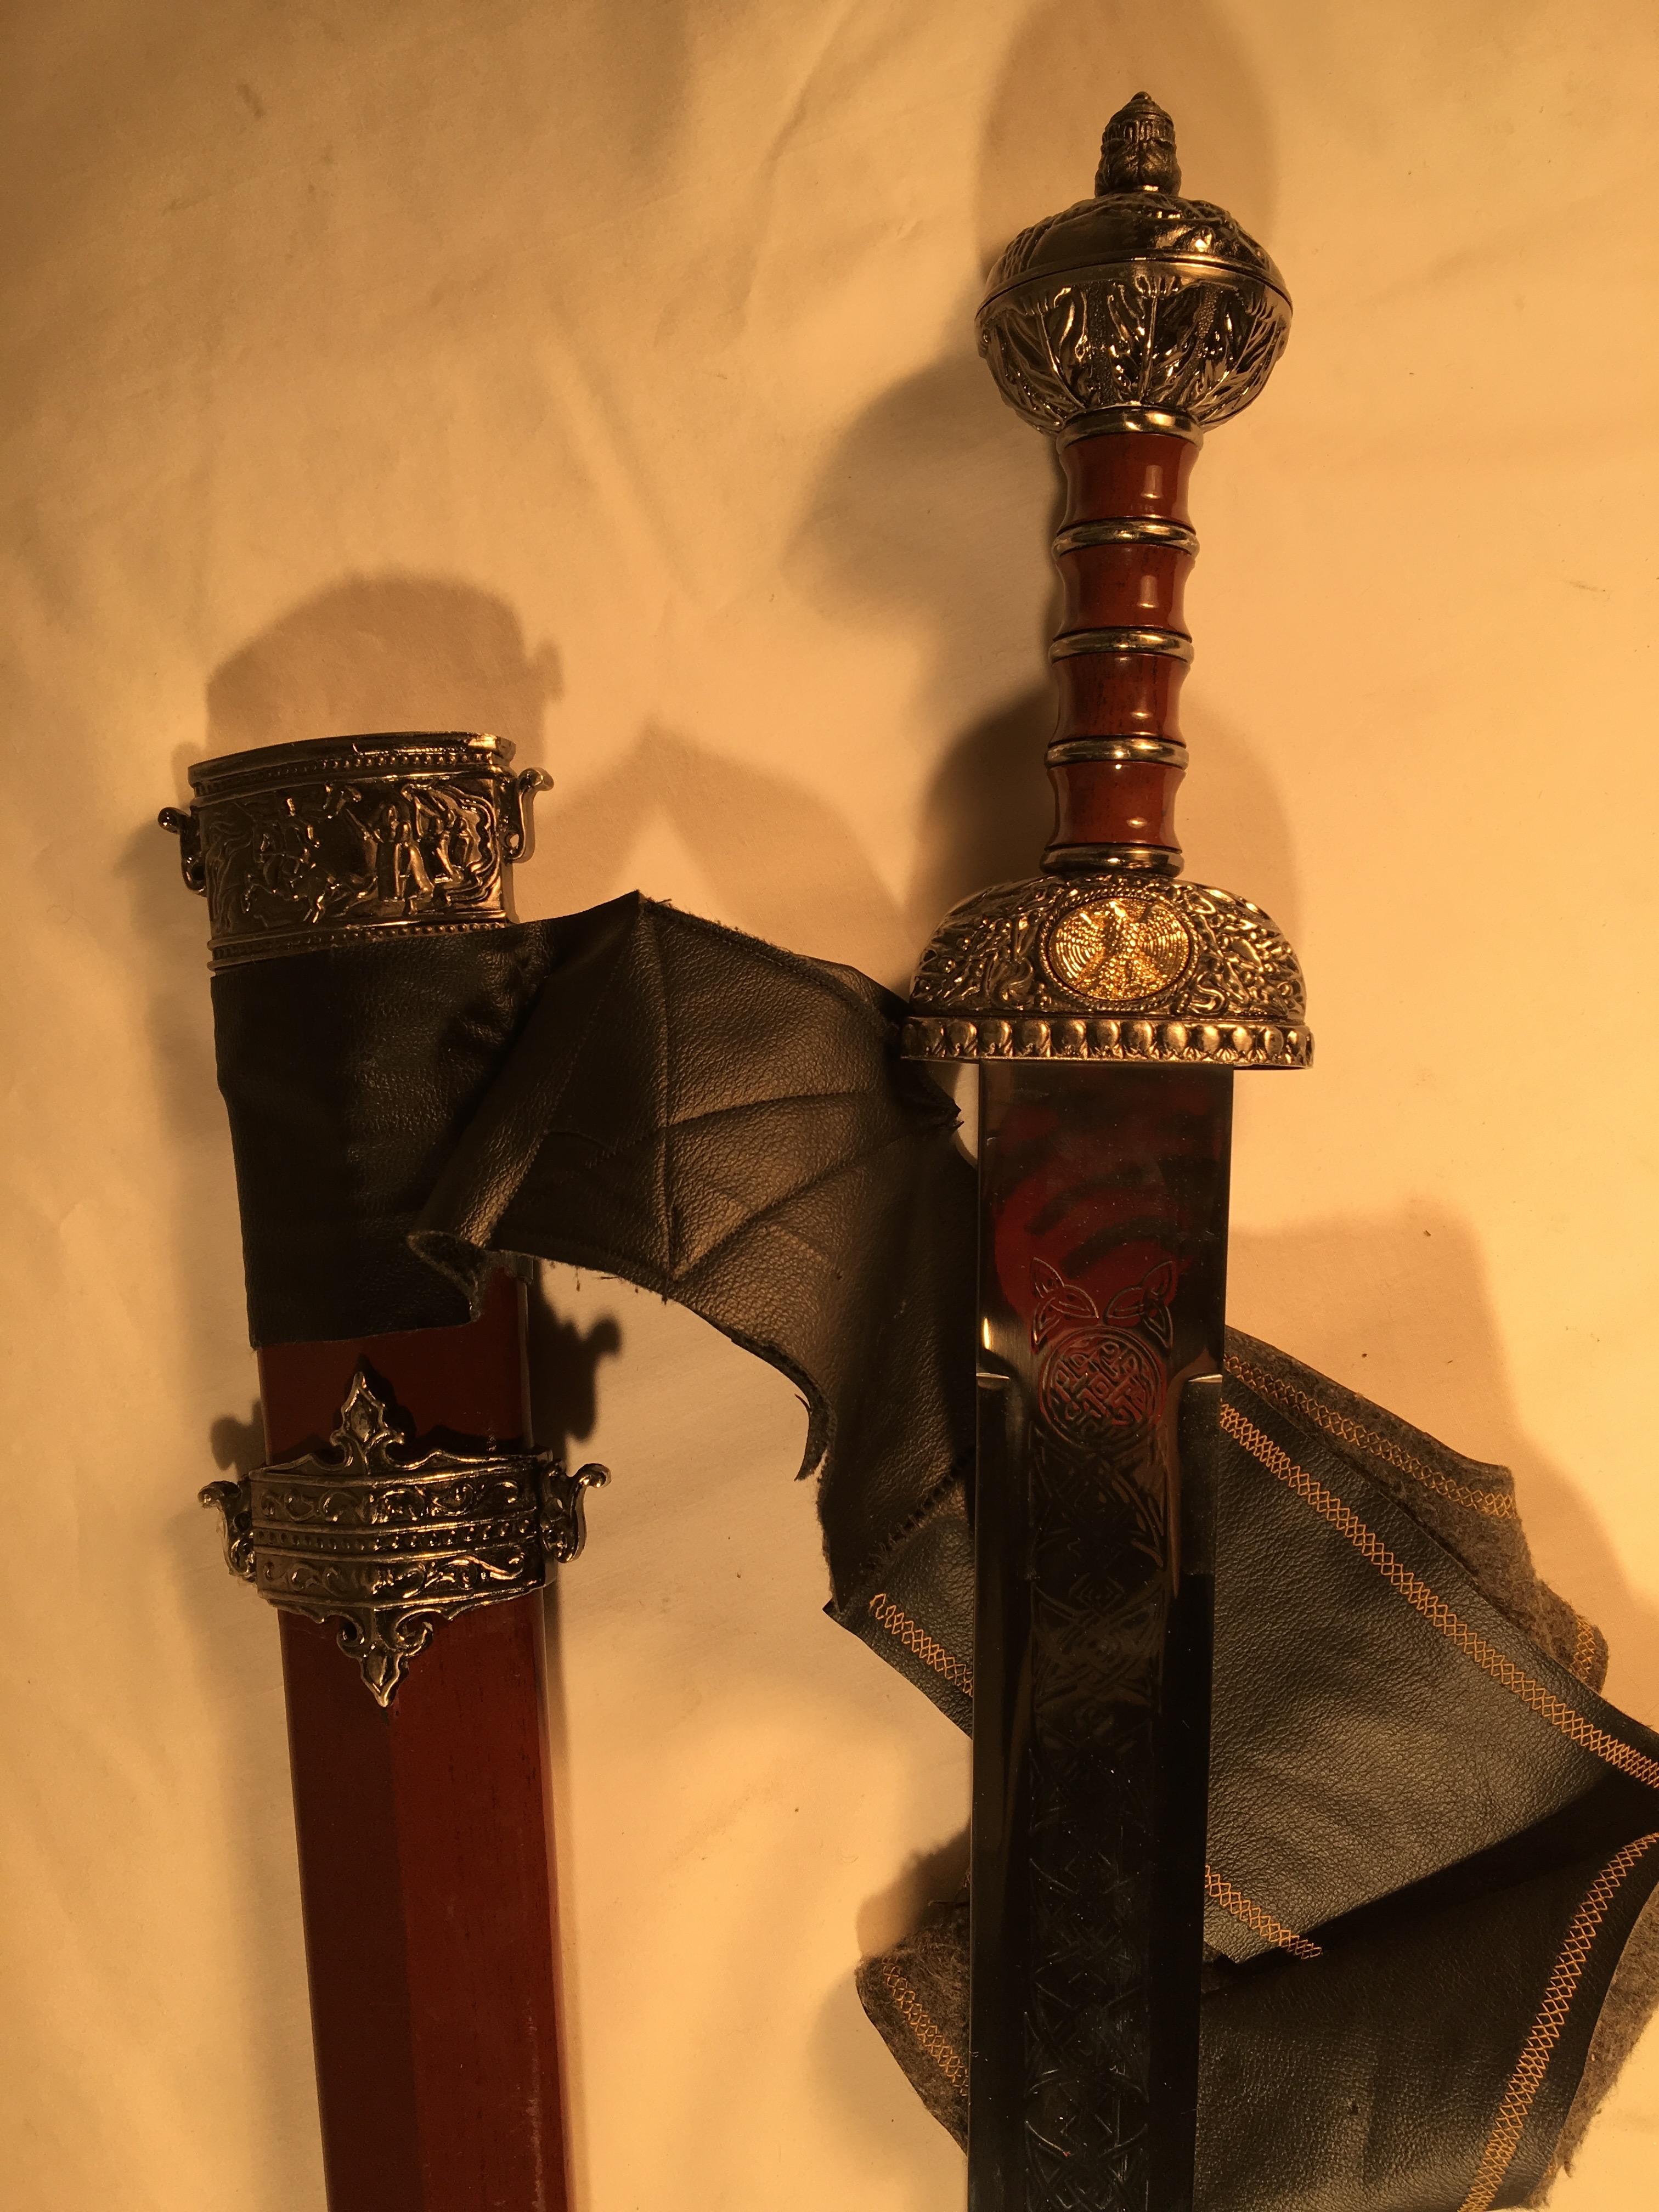 Sword, Roman Centurion Ornate